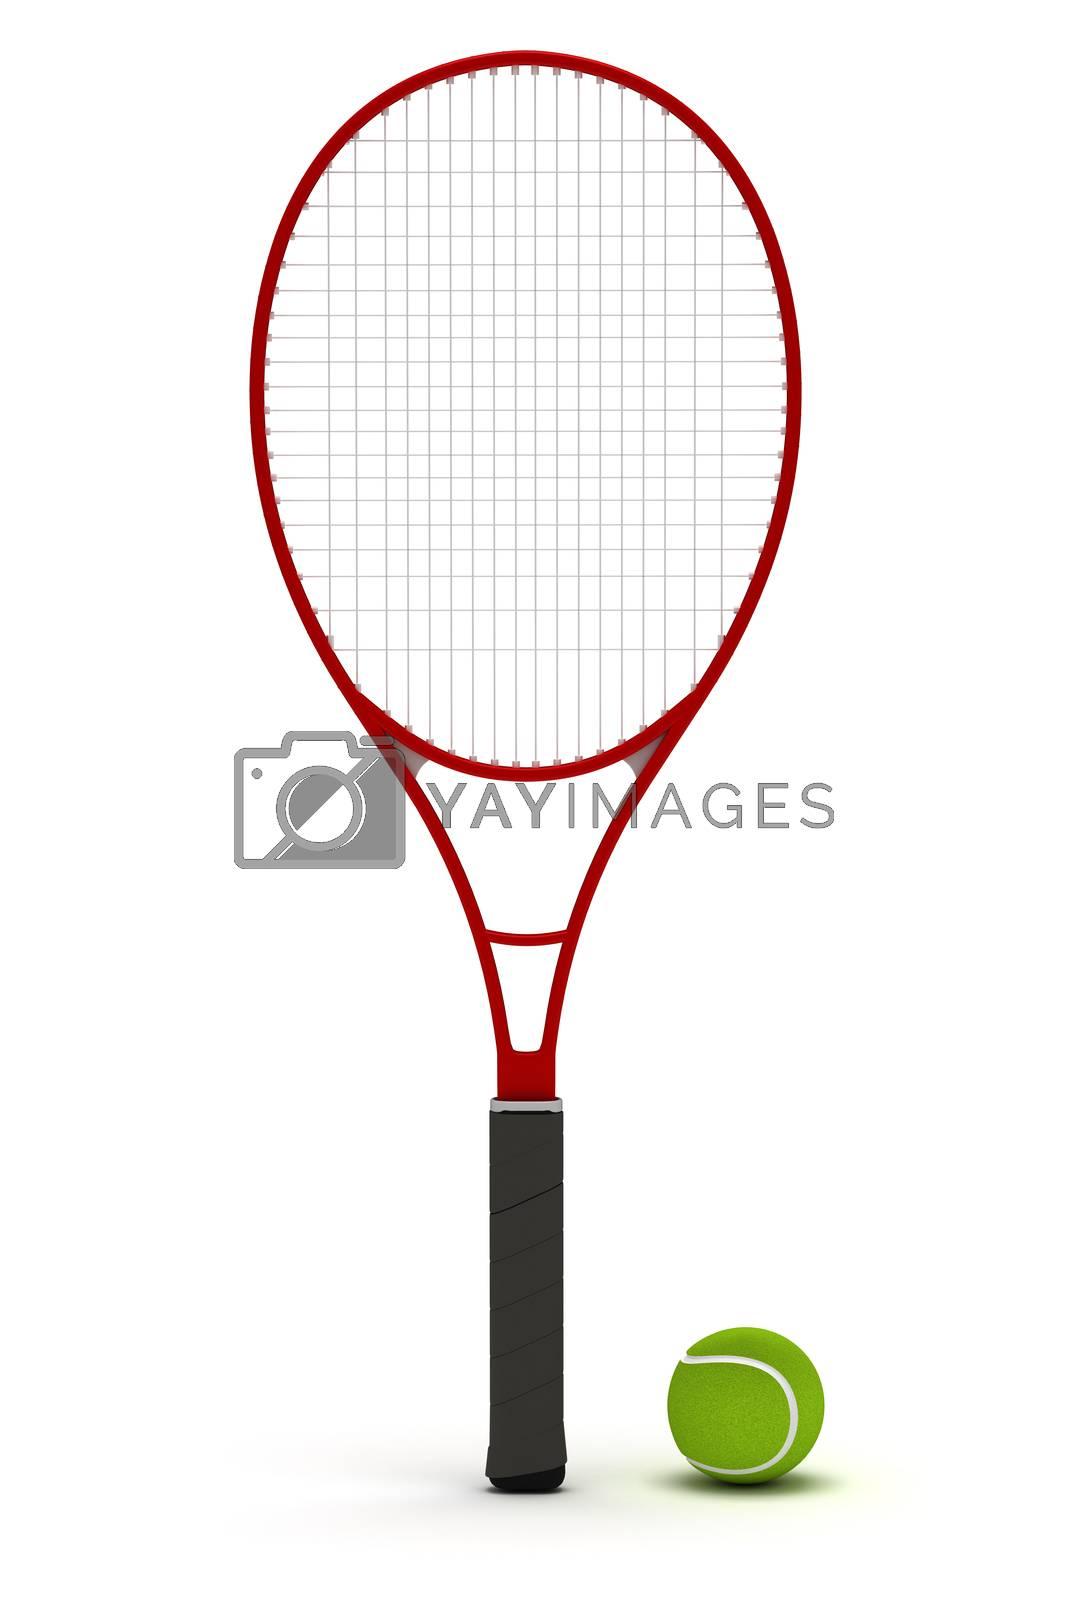 Royalty free image of Tennis Racket by selensergen